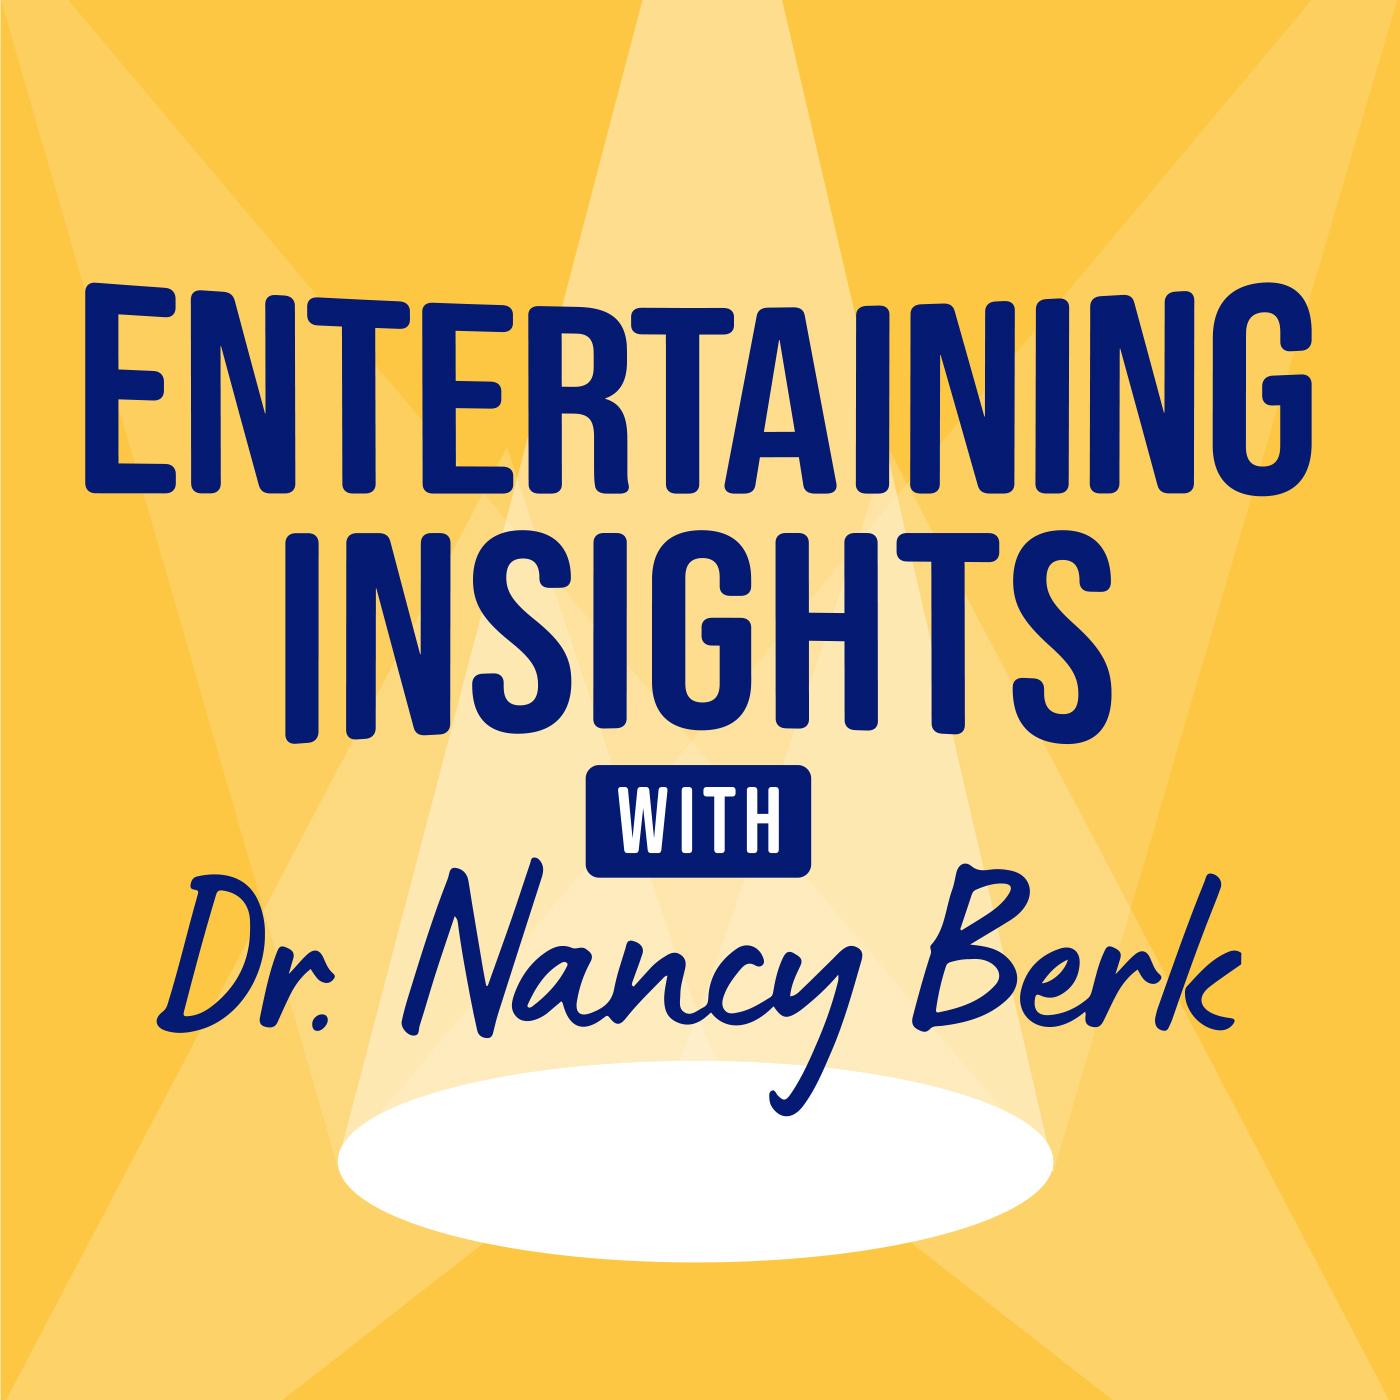 Entertaining Insights with Dr. Nancy Berk show art